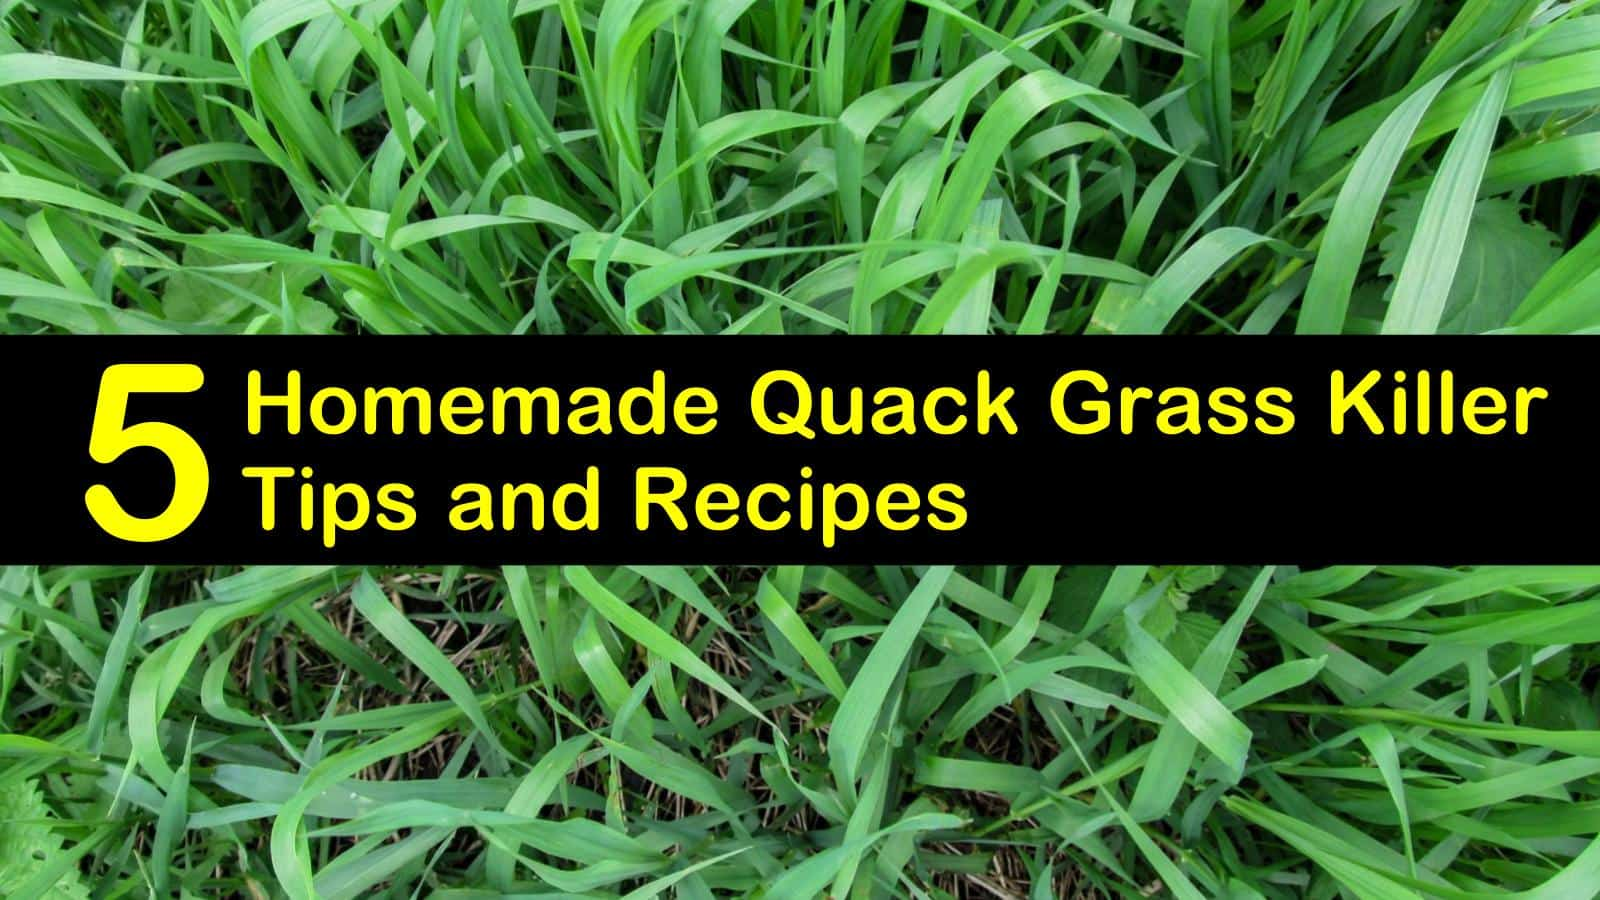 homemade quack grass killer titleimg1